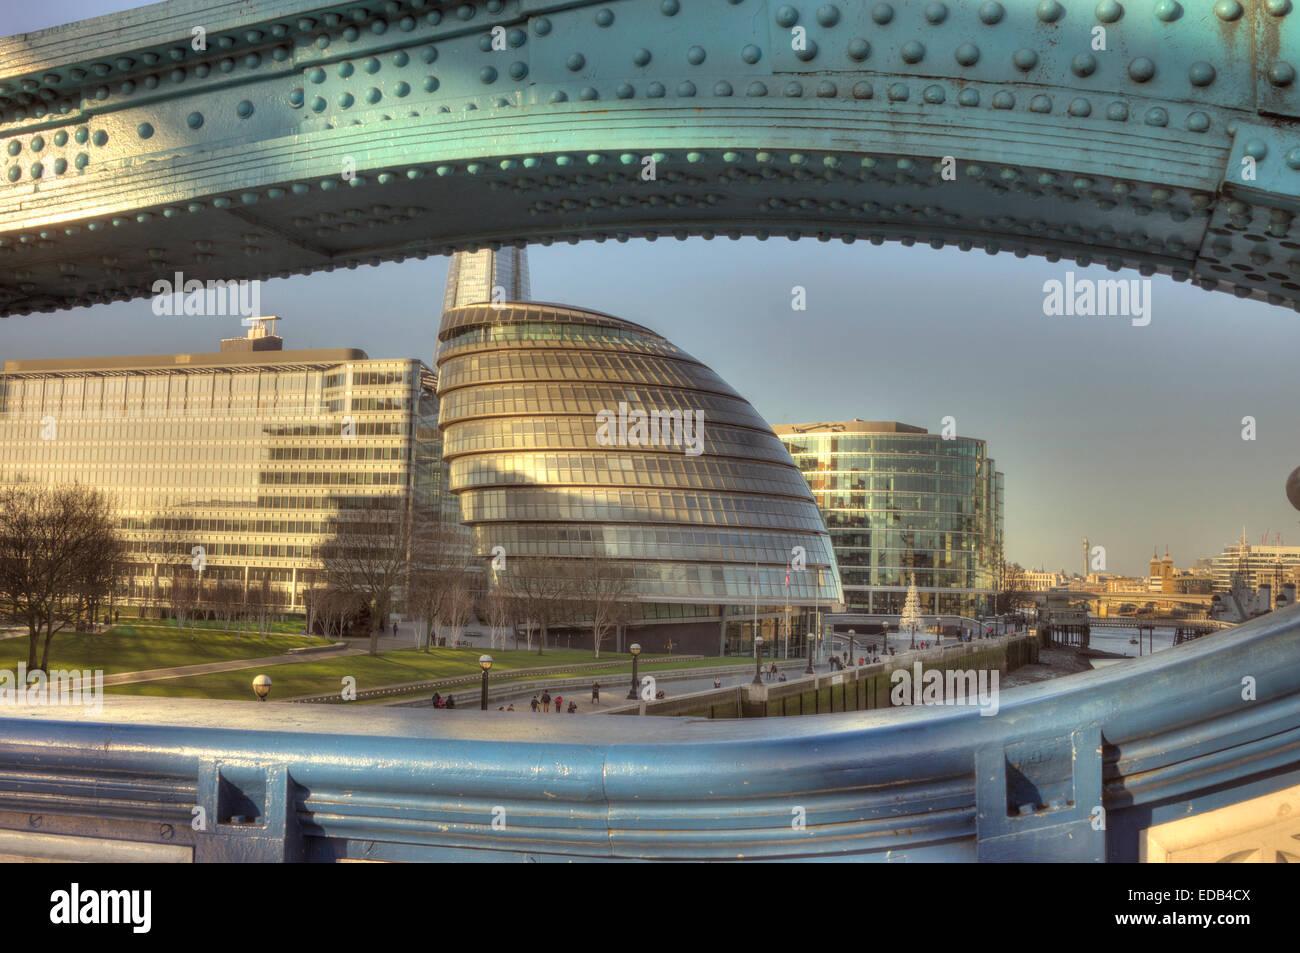 The City Hall London   GLA headquarters - Stock Image